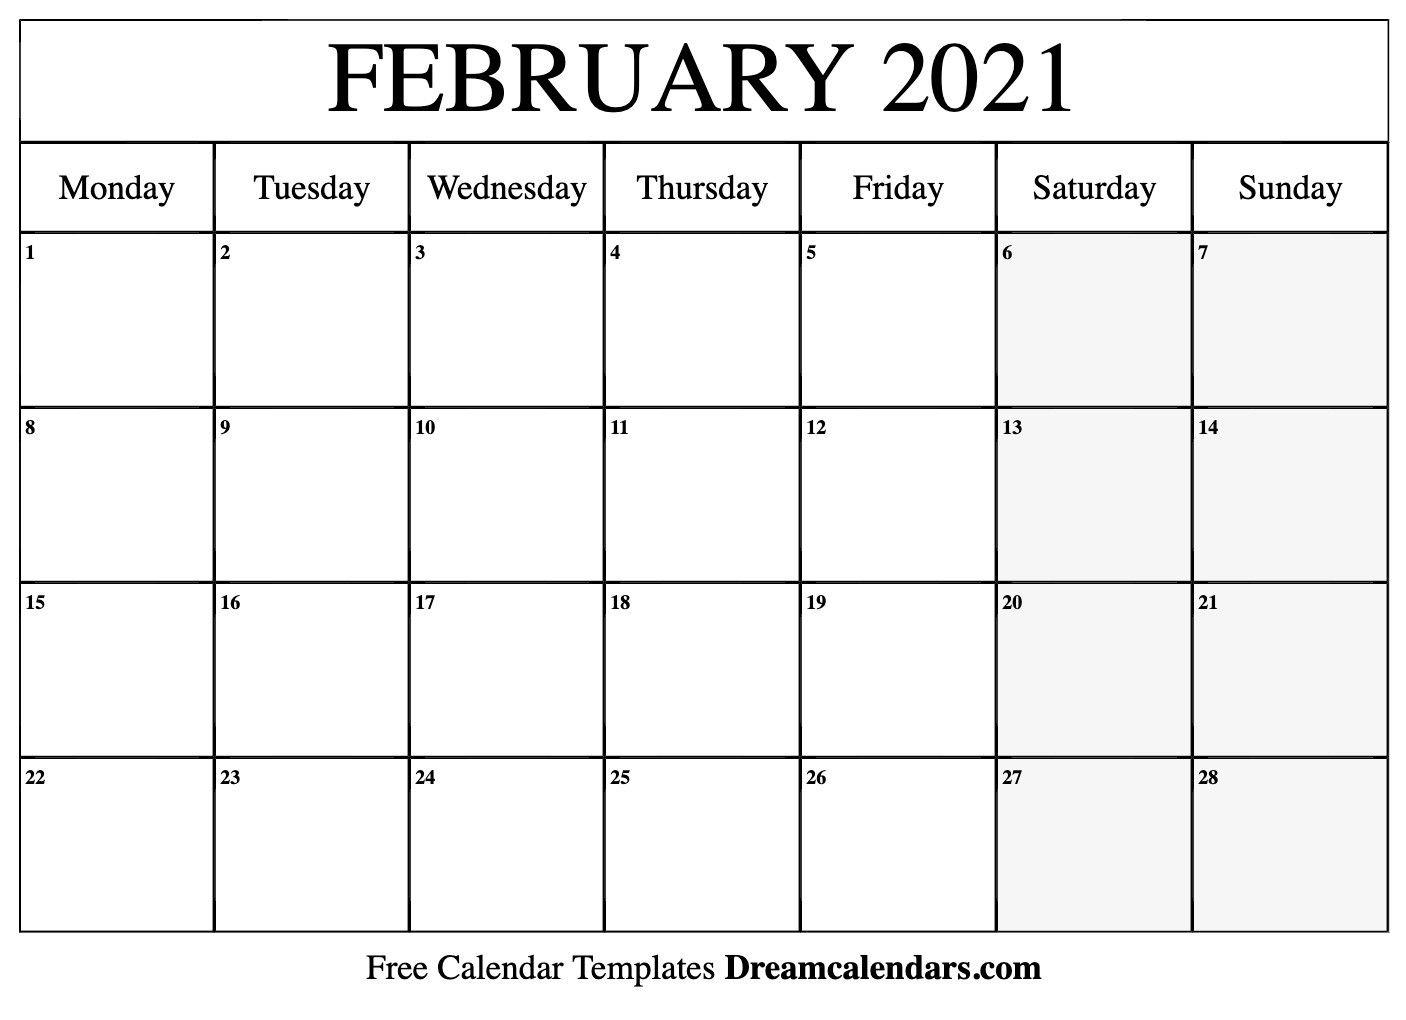 2021 Calendar February Template In 2020 | Calendar Word